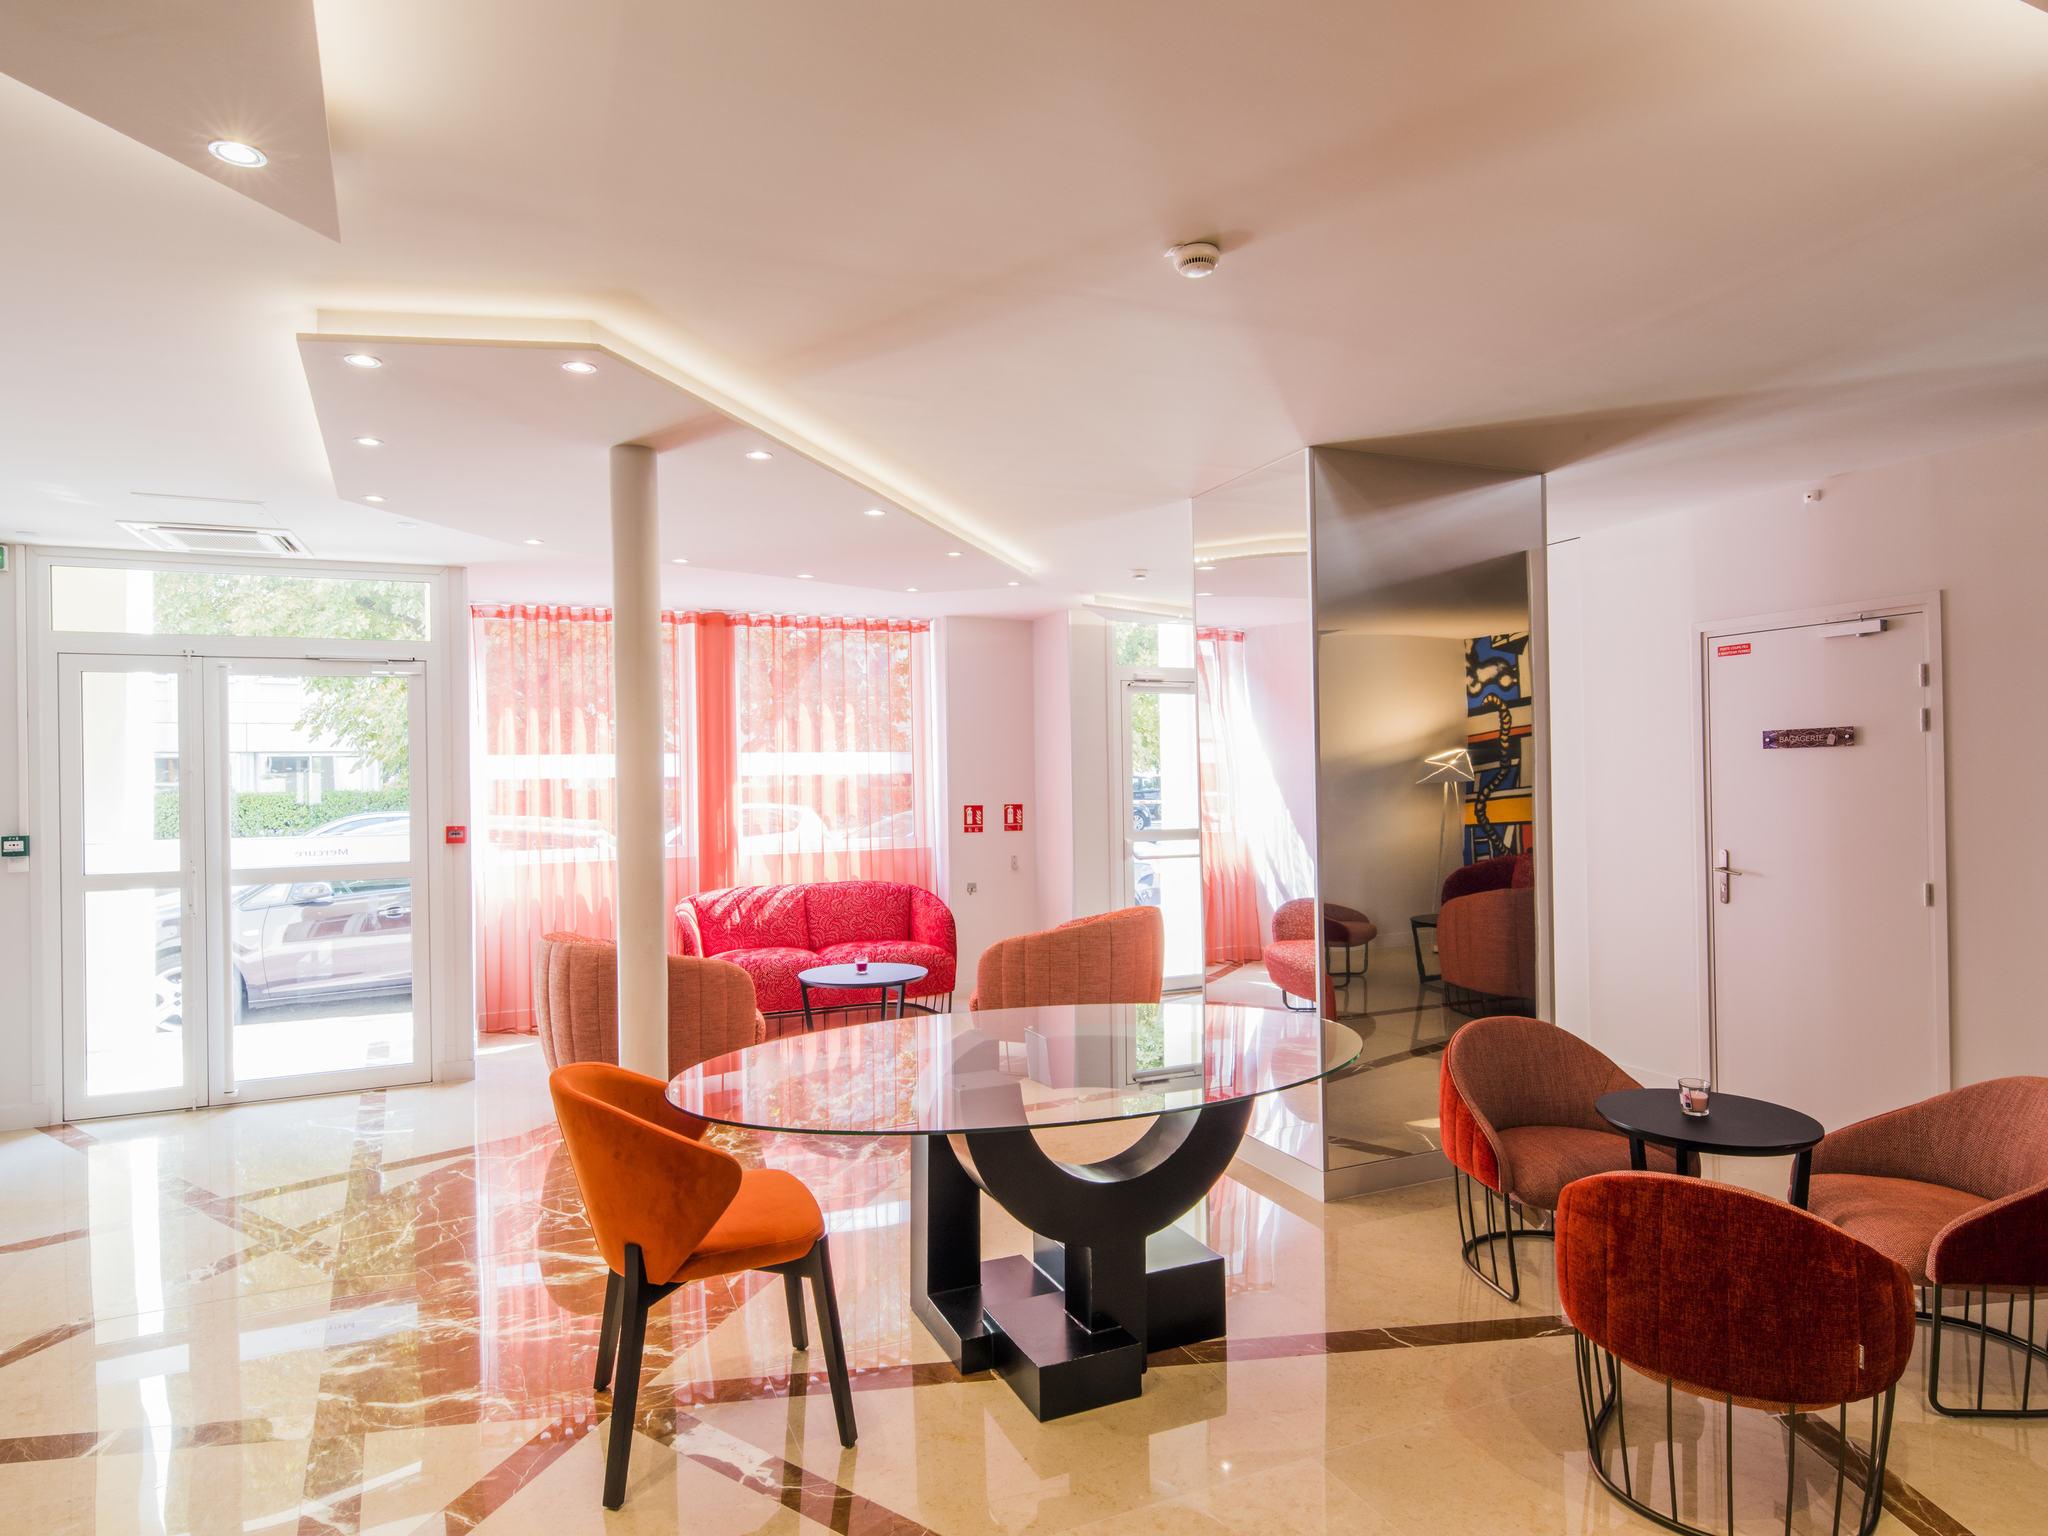 Hotel – Mercure Paris Pont De Levallois Neuilly (otwarcie czerwiec 2018)